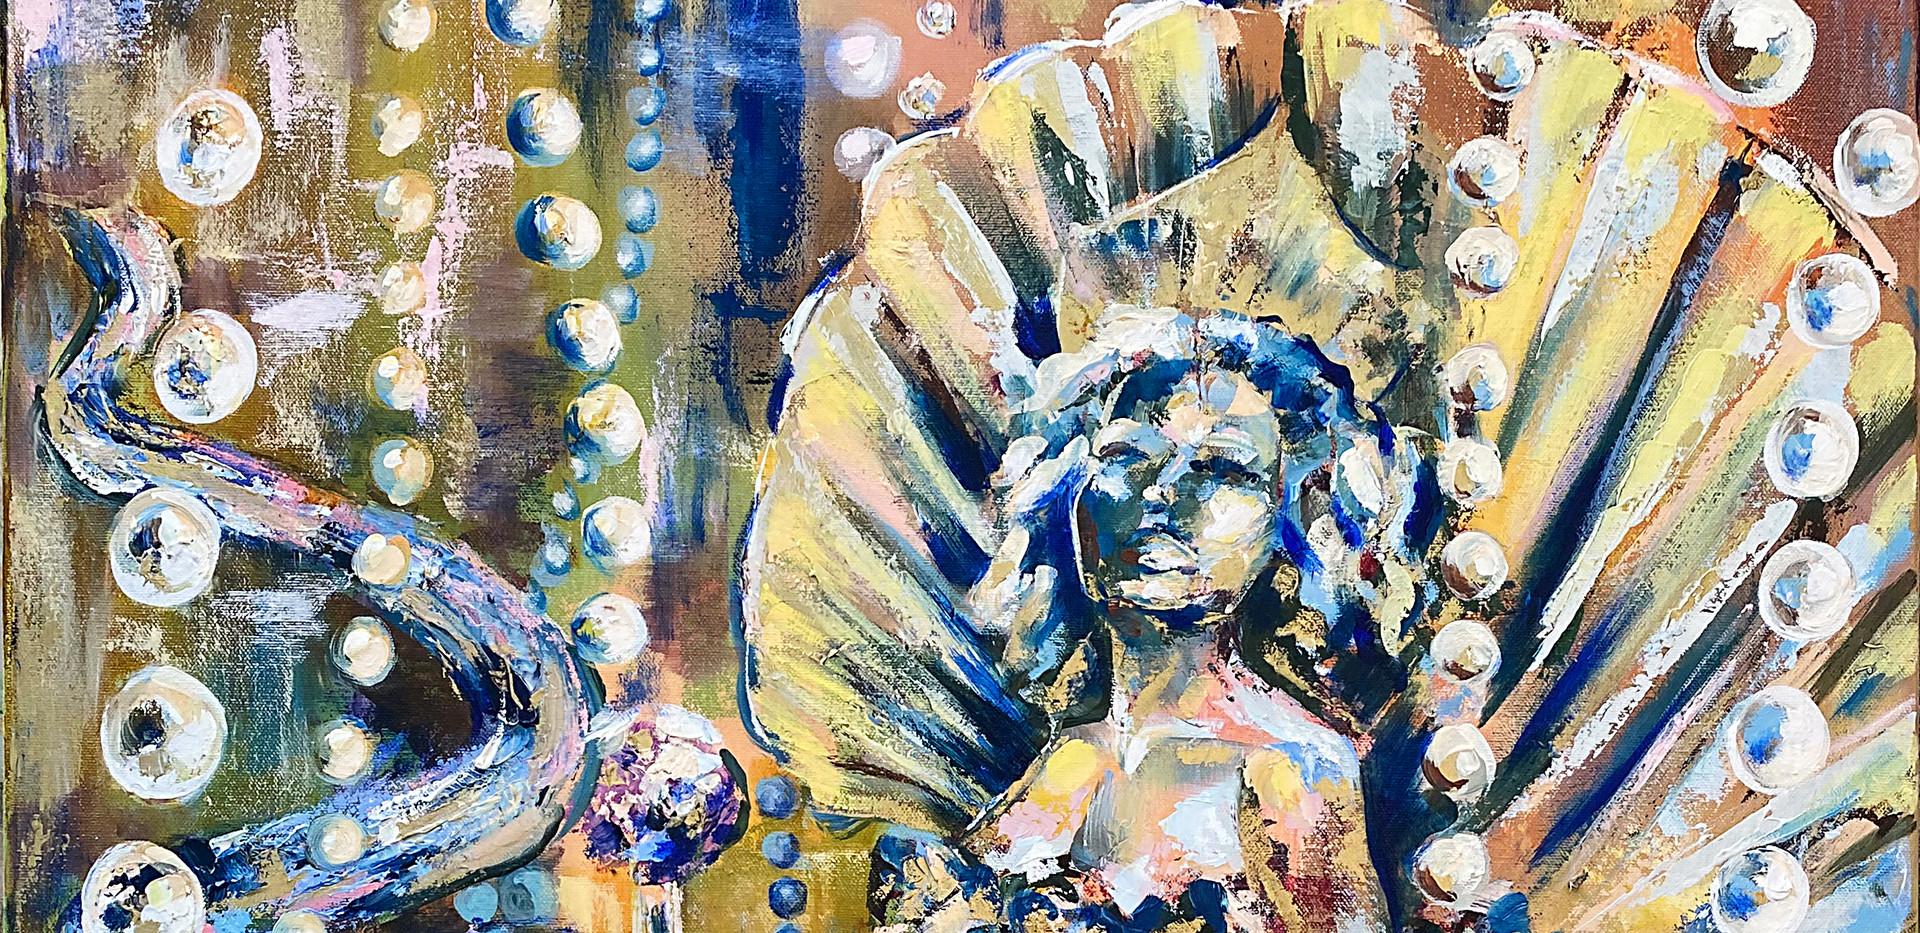 Goddess of Pearls